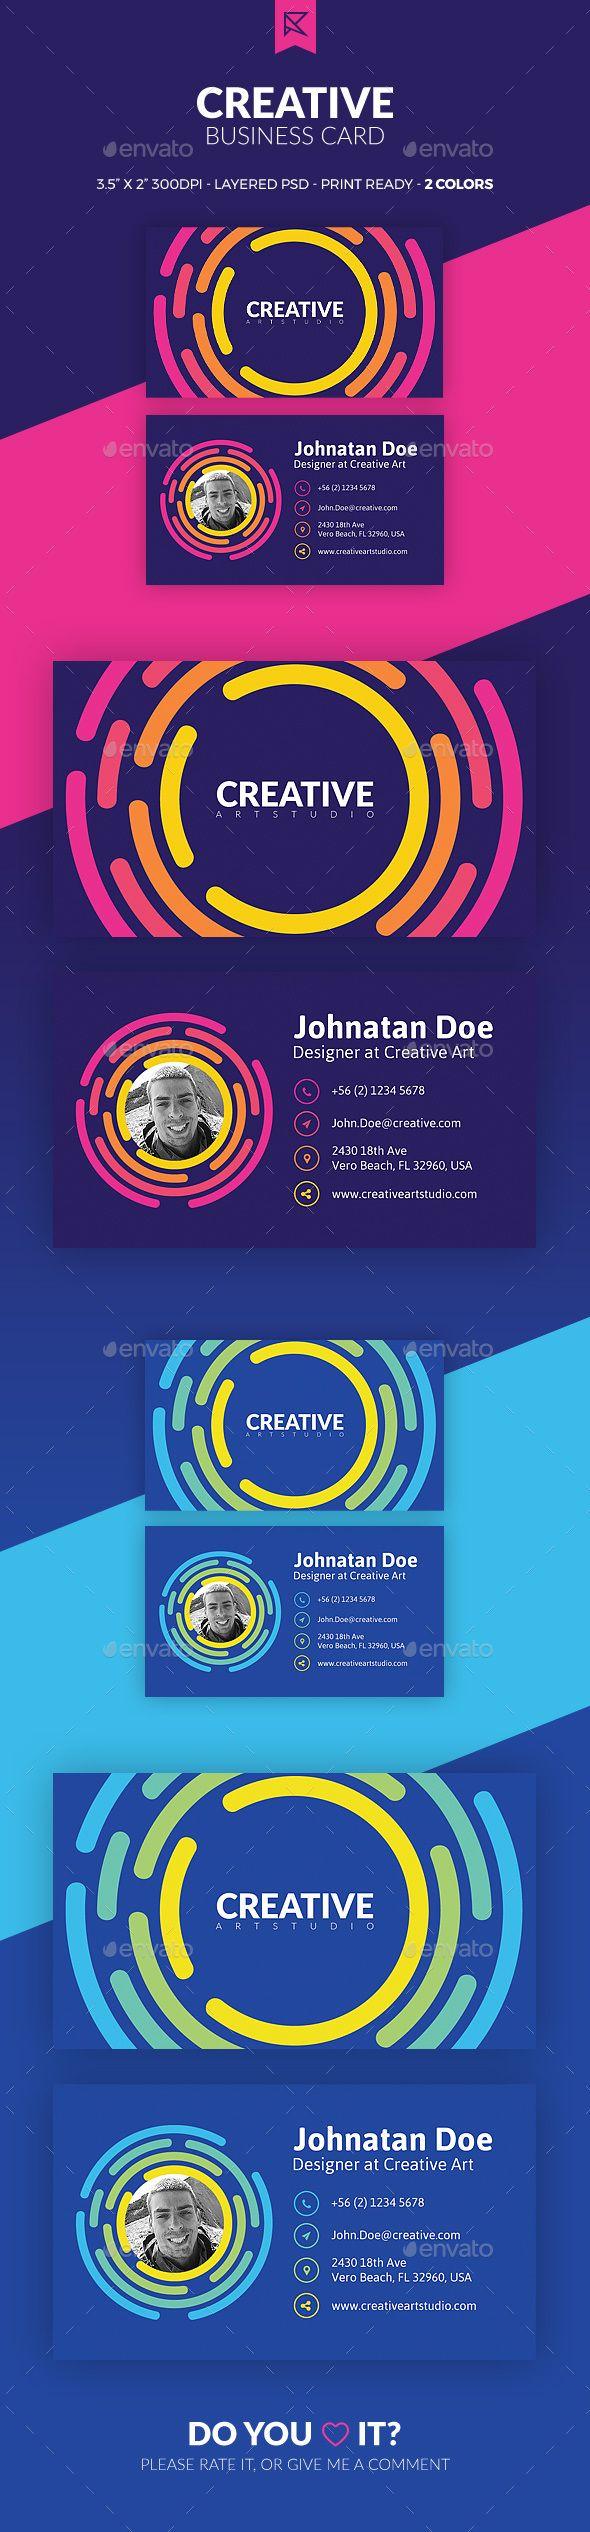 Creative Business Card Design Template PSD